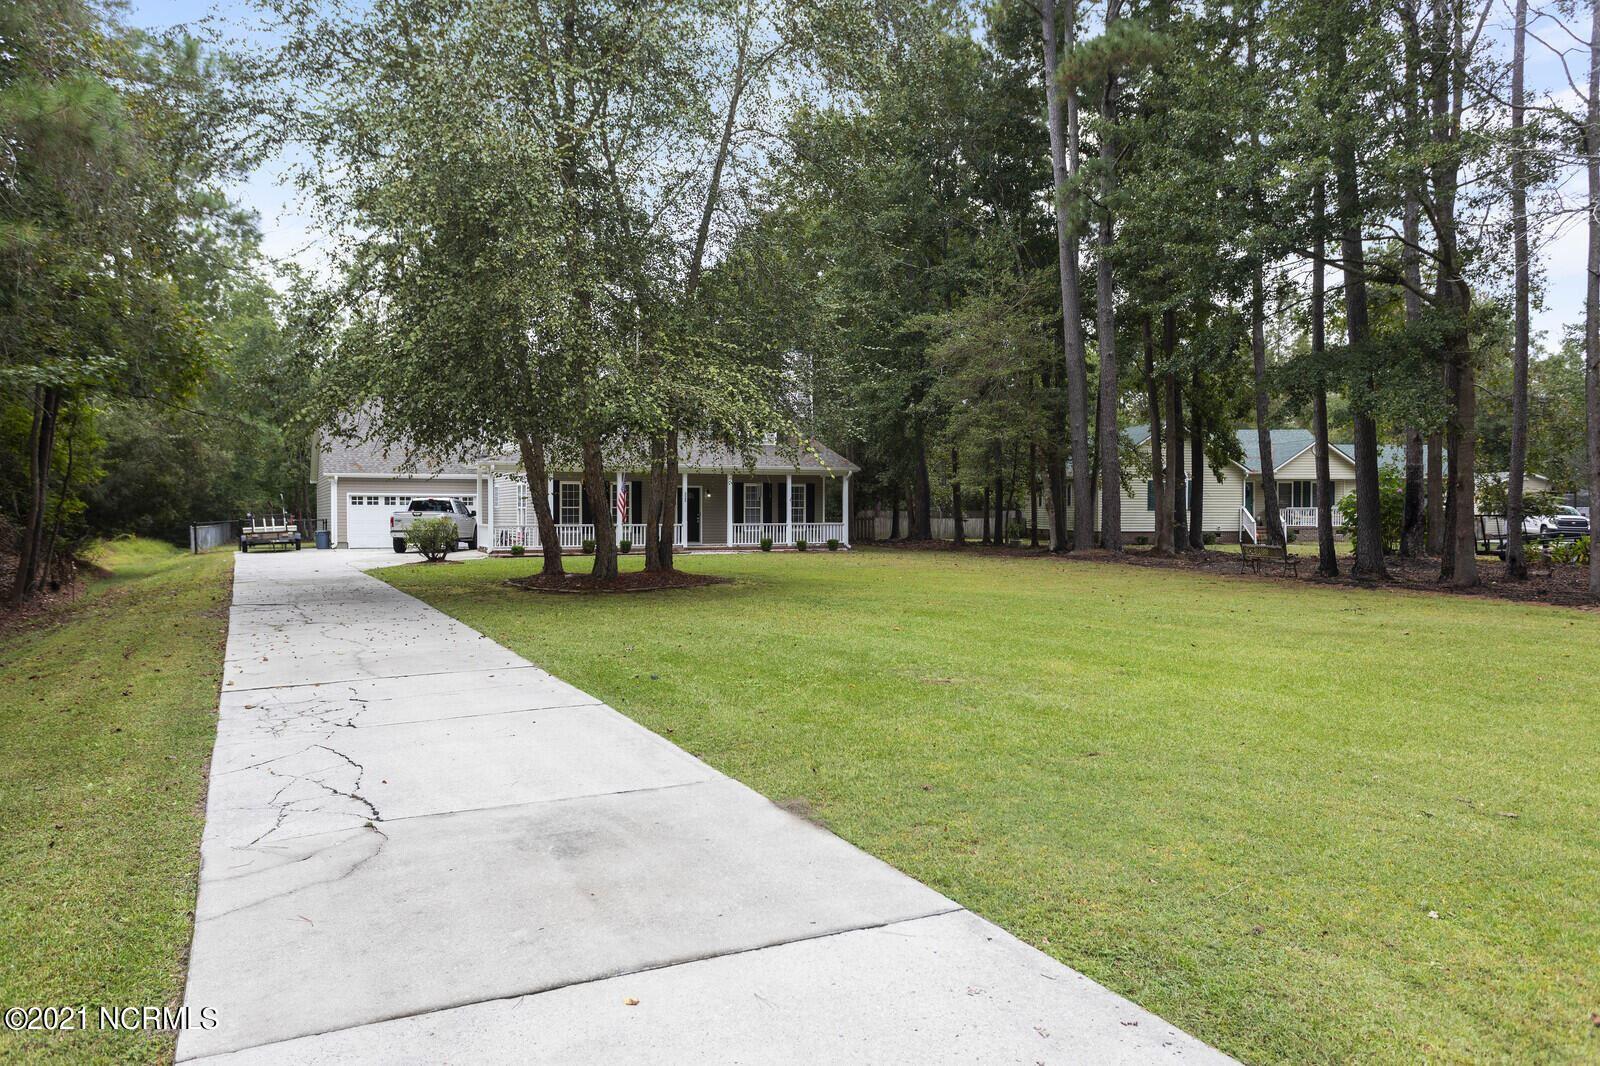 Photo of 325 Morgan Cove Drive, Burgaw, NC 28425 (MLS # 100294641)